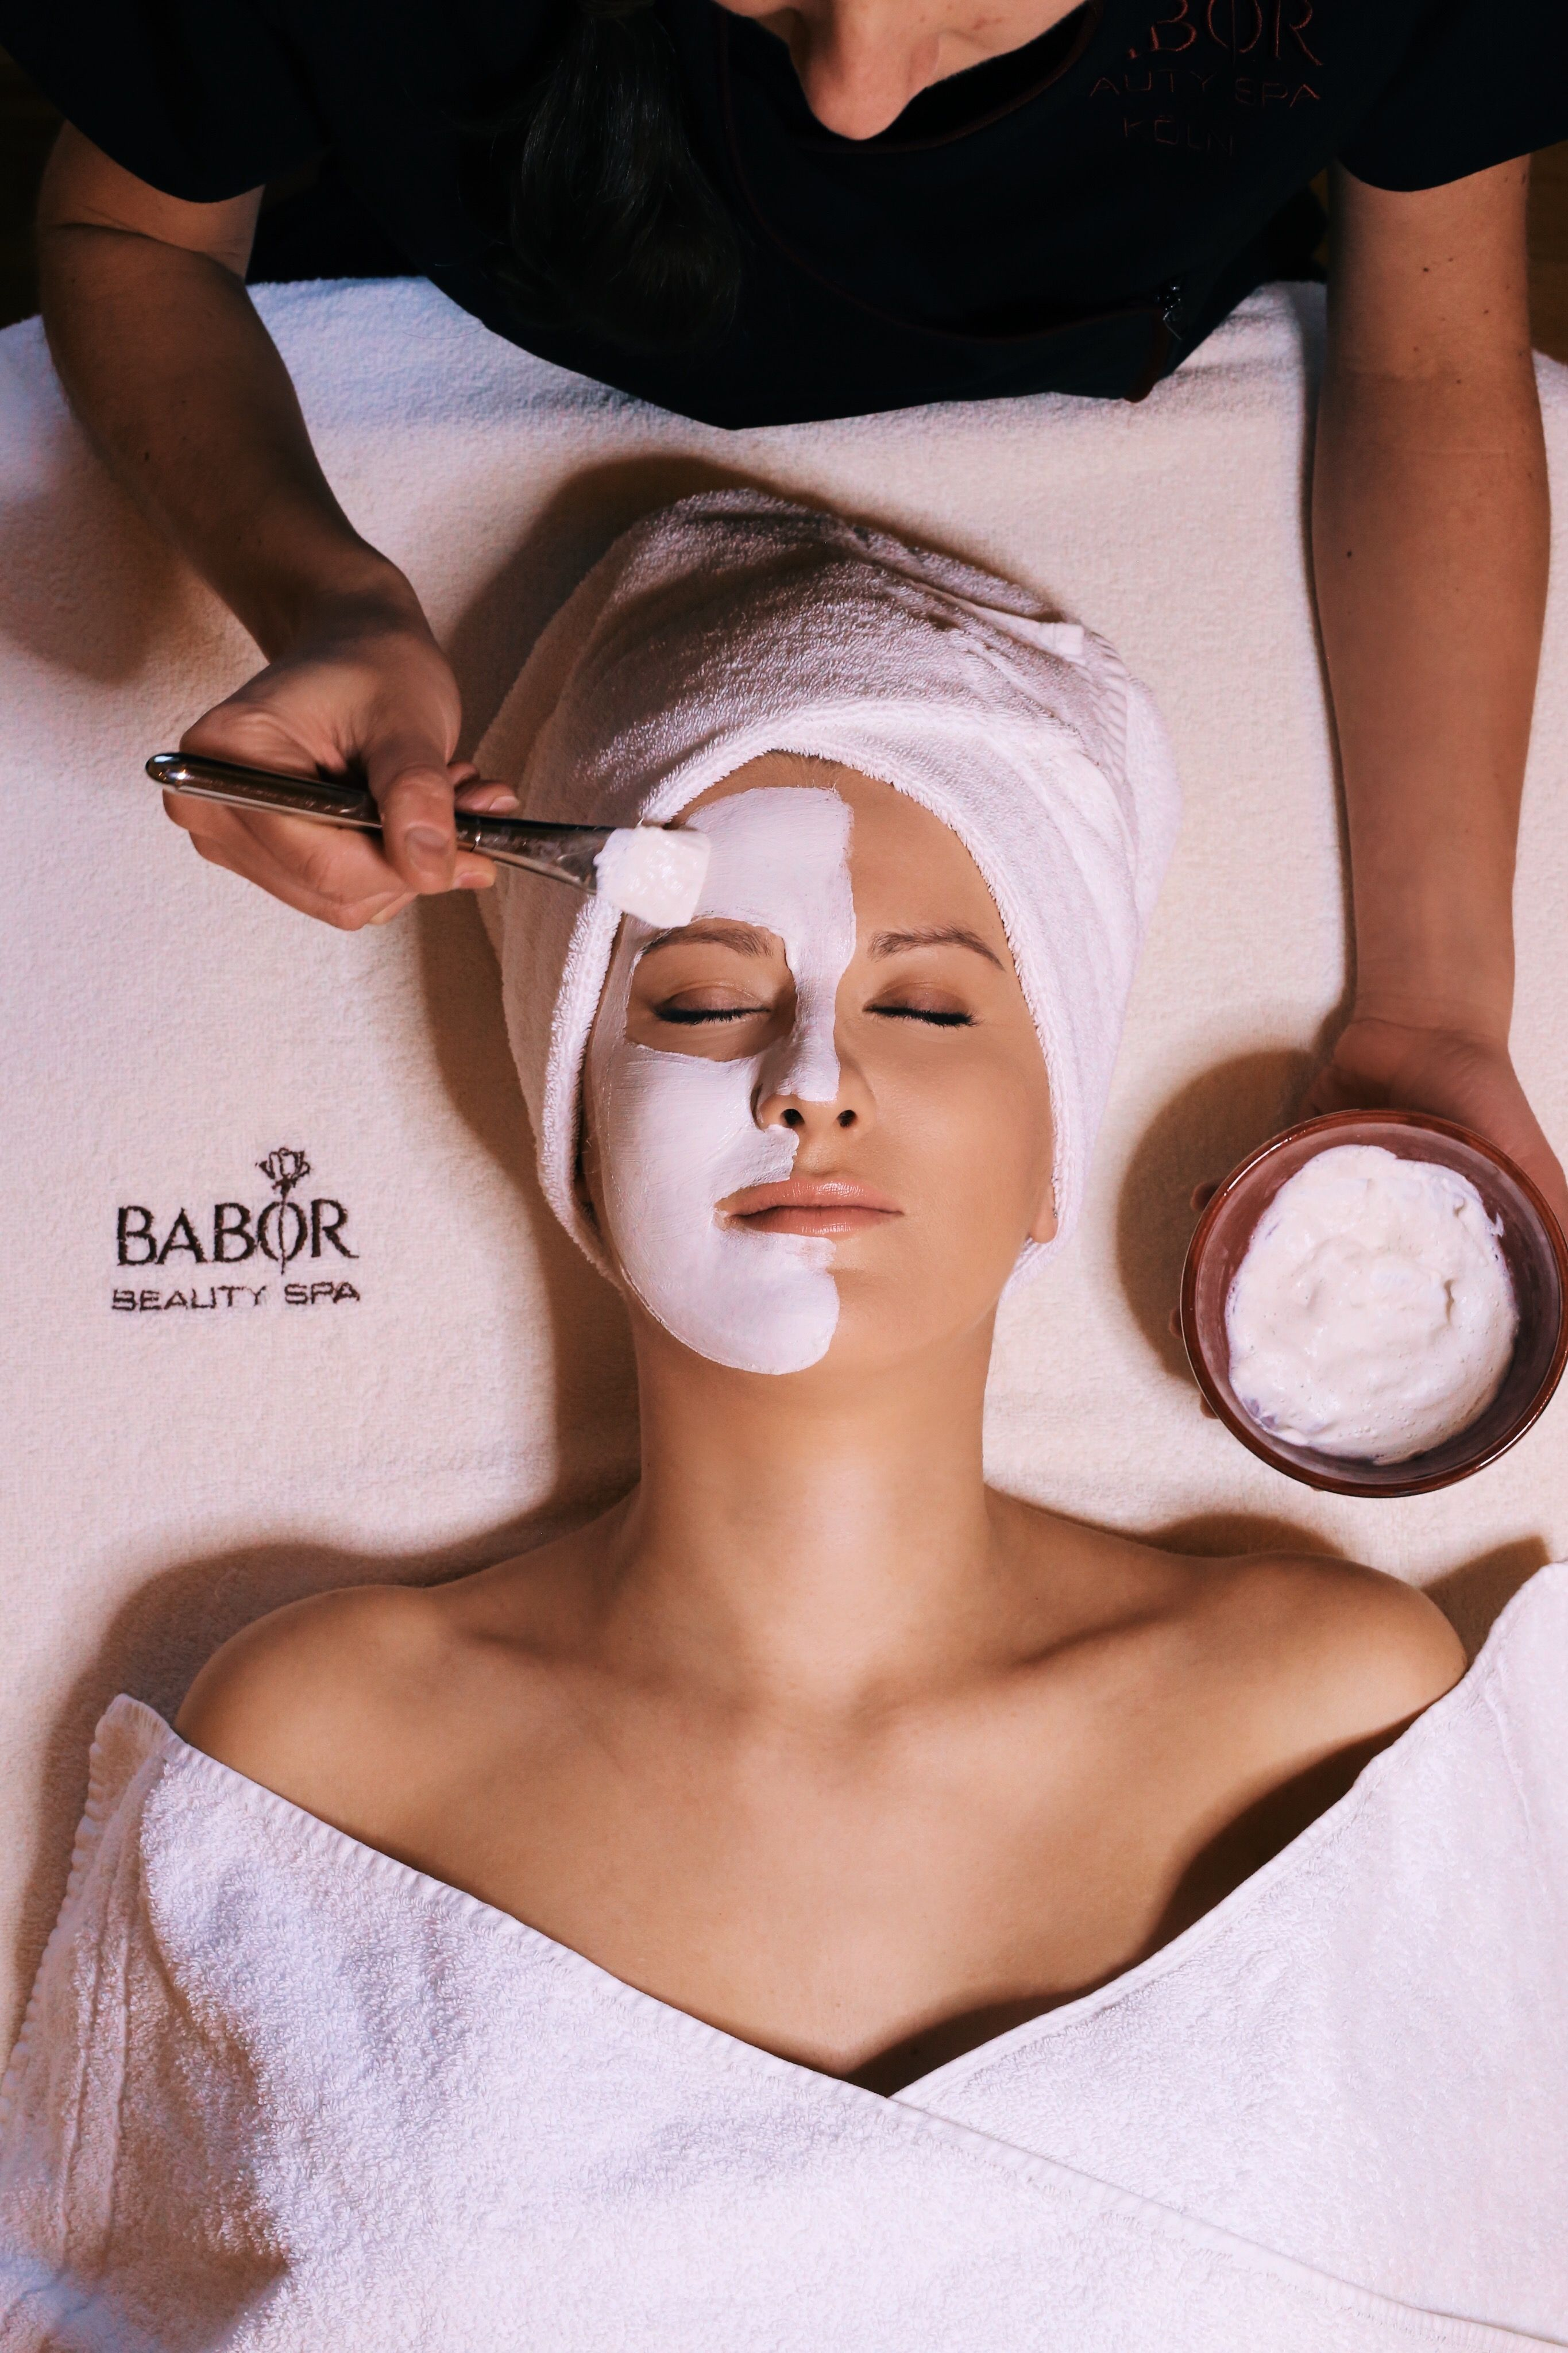 BABOR Beauty Spa in 5  Schönheitsfleck, Schönheitsklinik